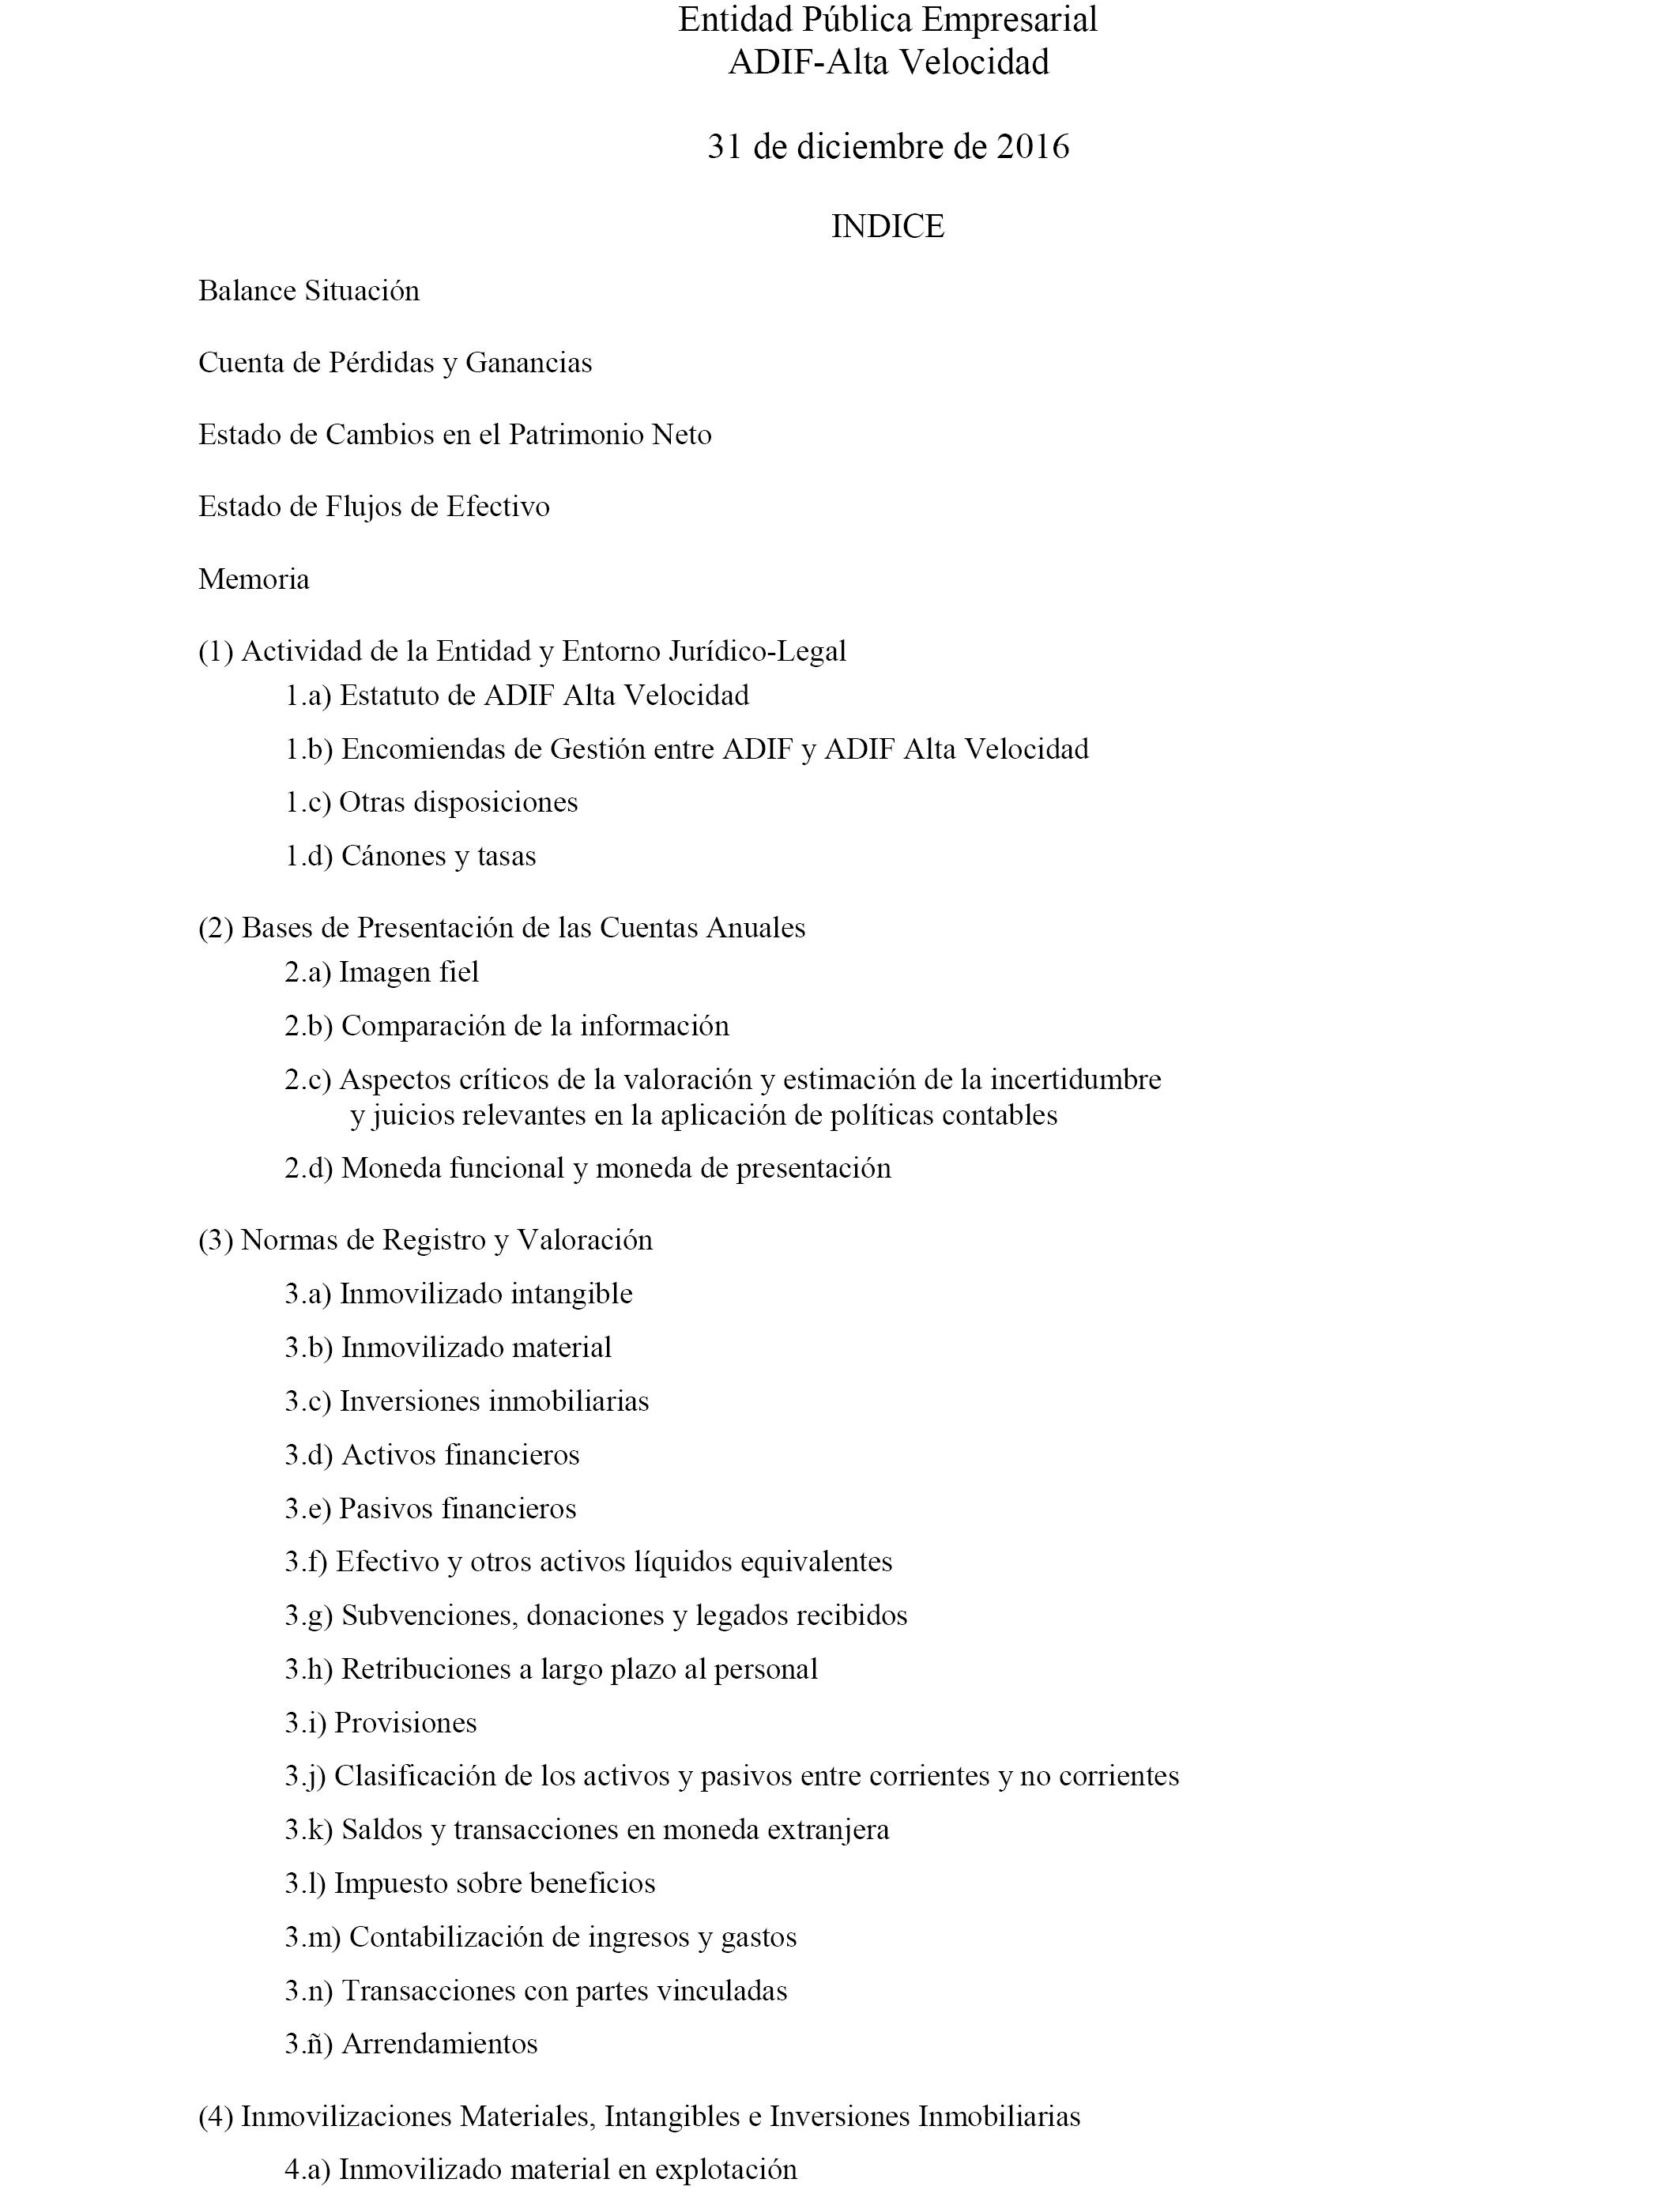 BOE.es - Documento BOE-A-2017-8856